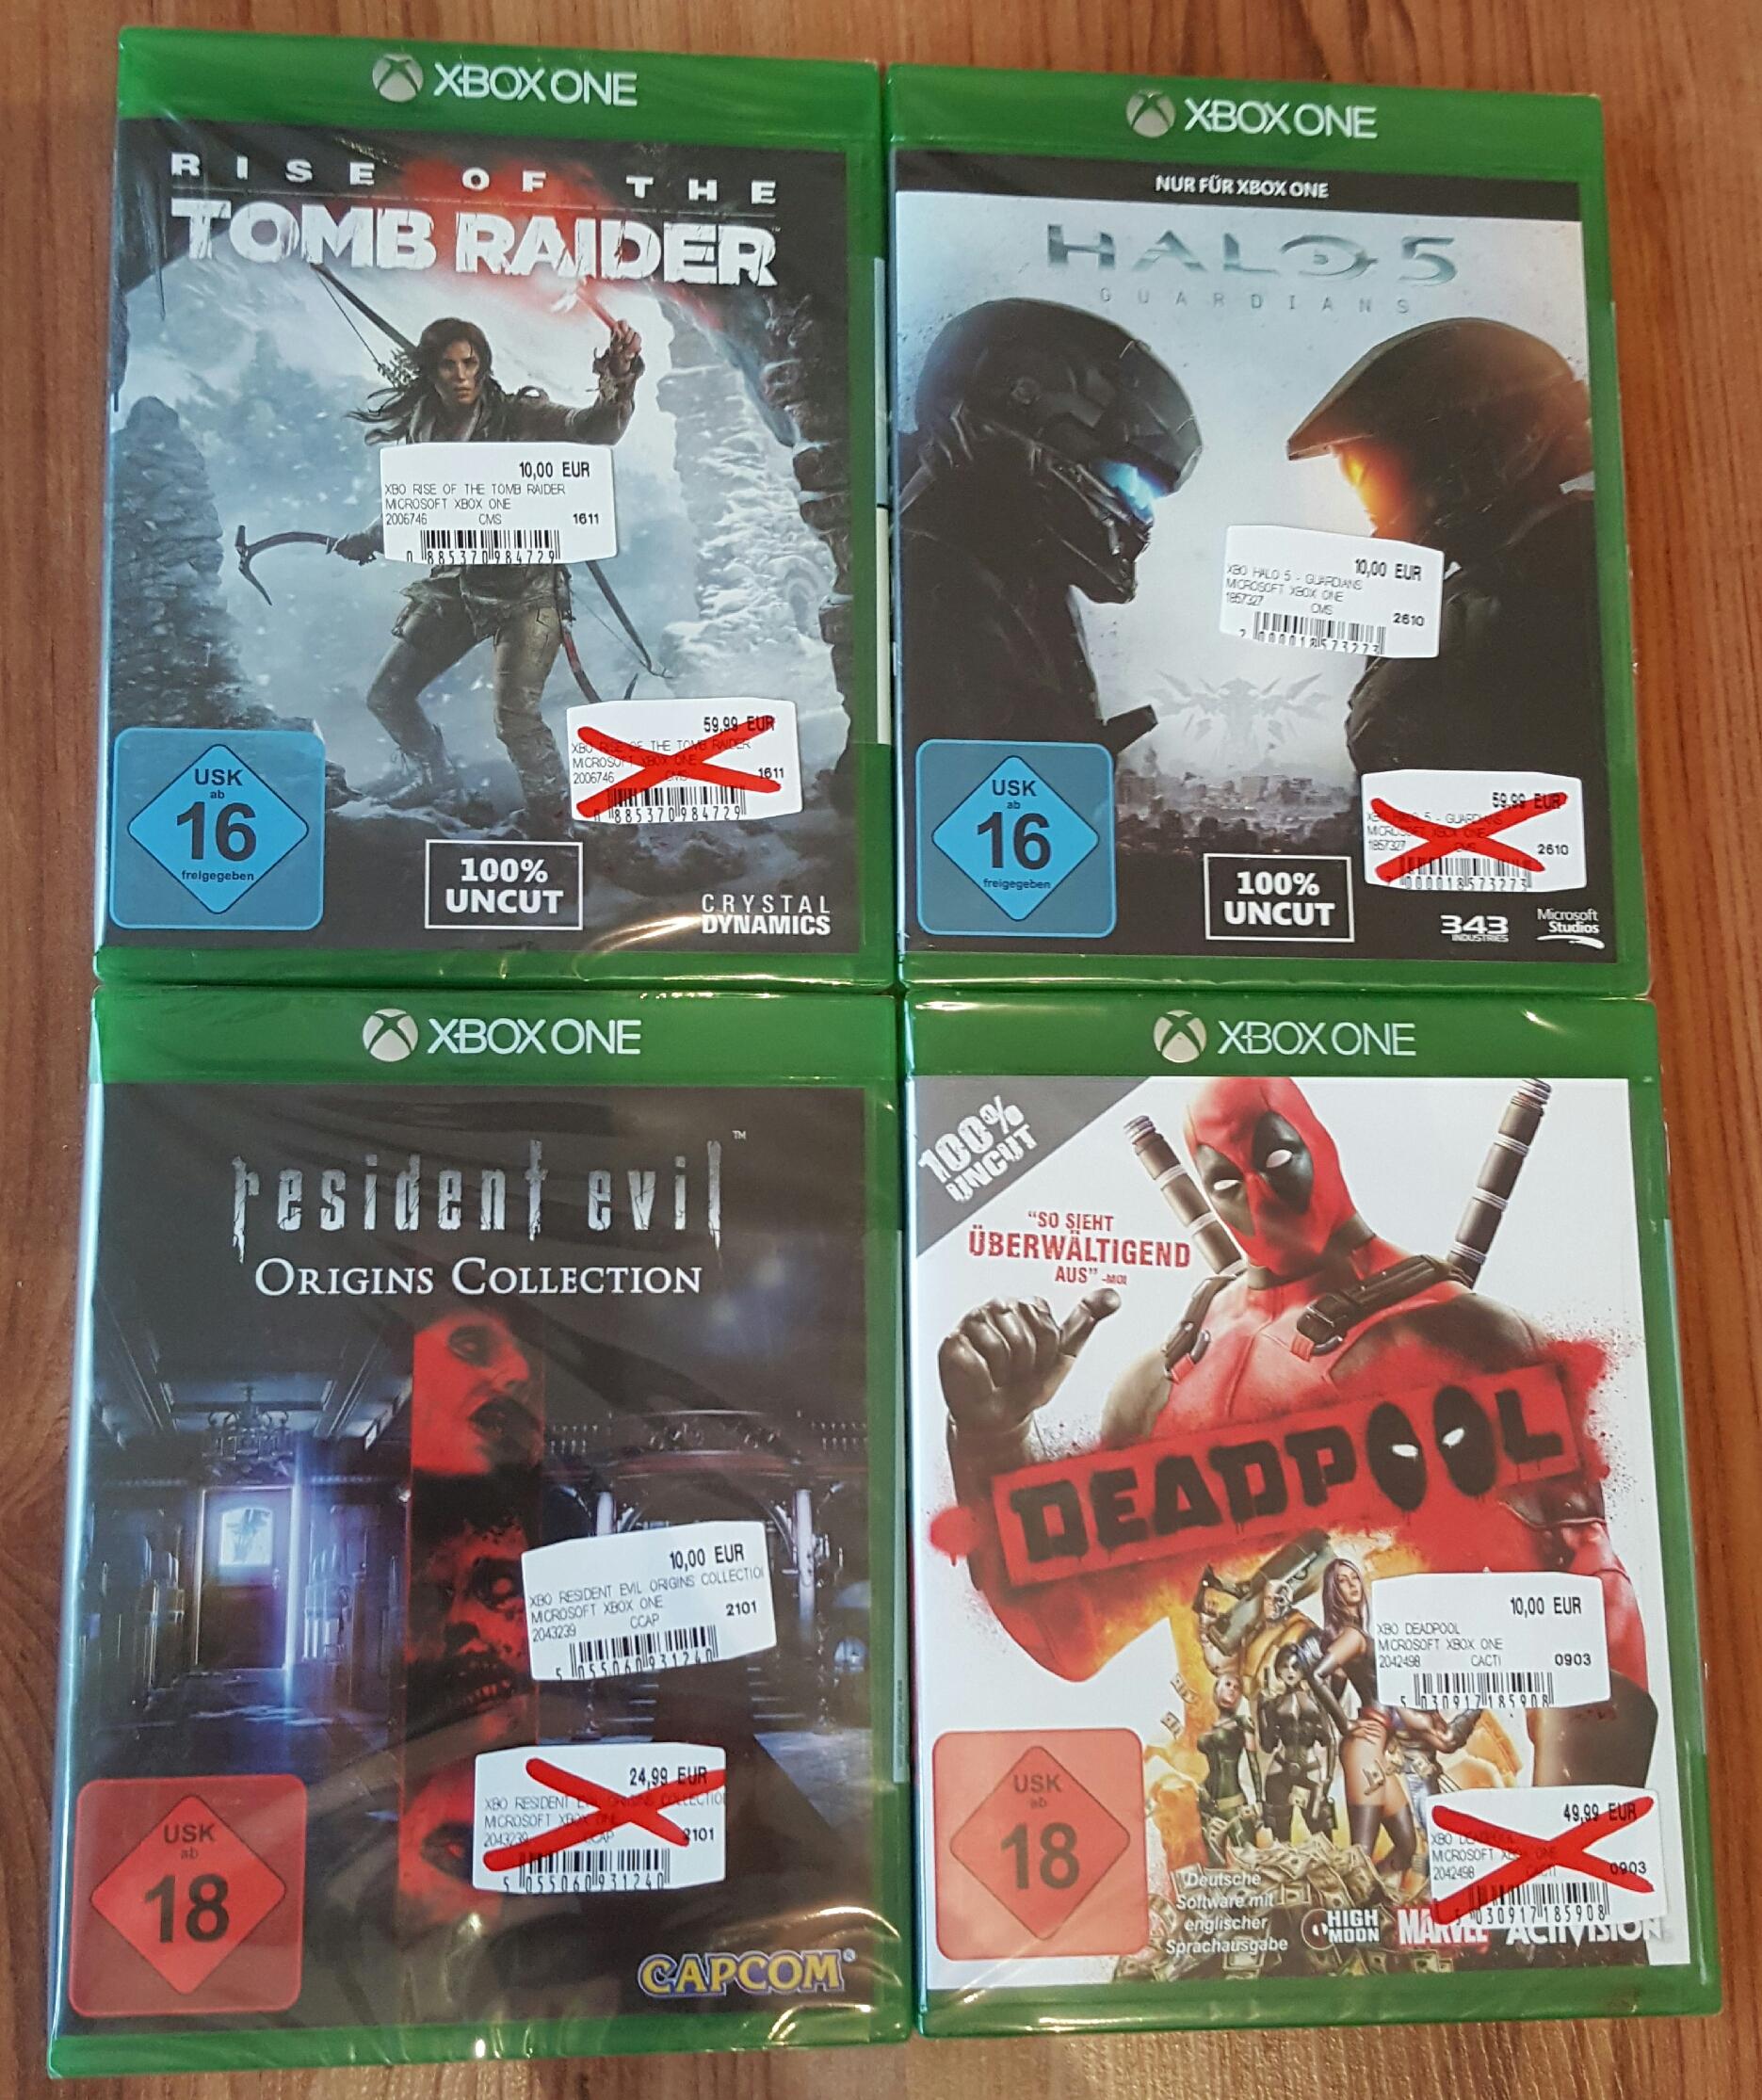 [Lokal MediaMarkt Emden] Xbox One | PS4 | PC Spiele - zb. Halo 5 , Deadpool , Rise of the Tomb Raider, uvm, je 10 €